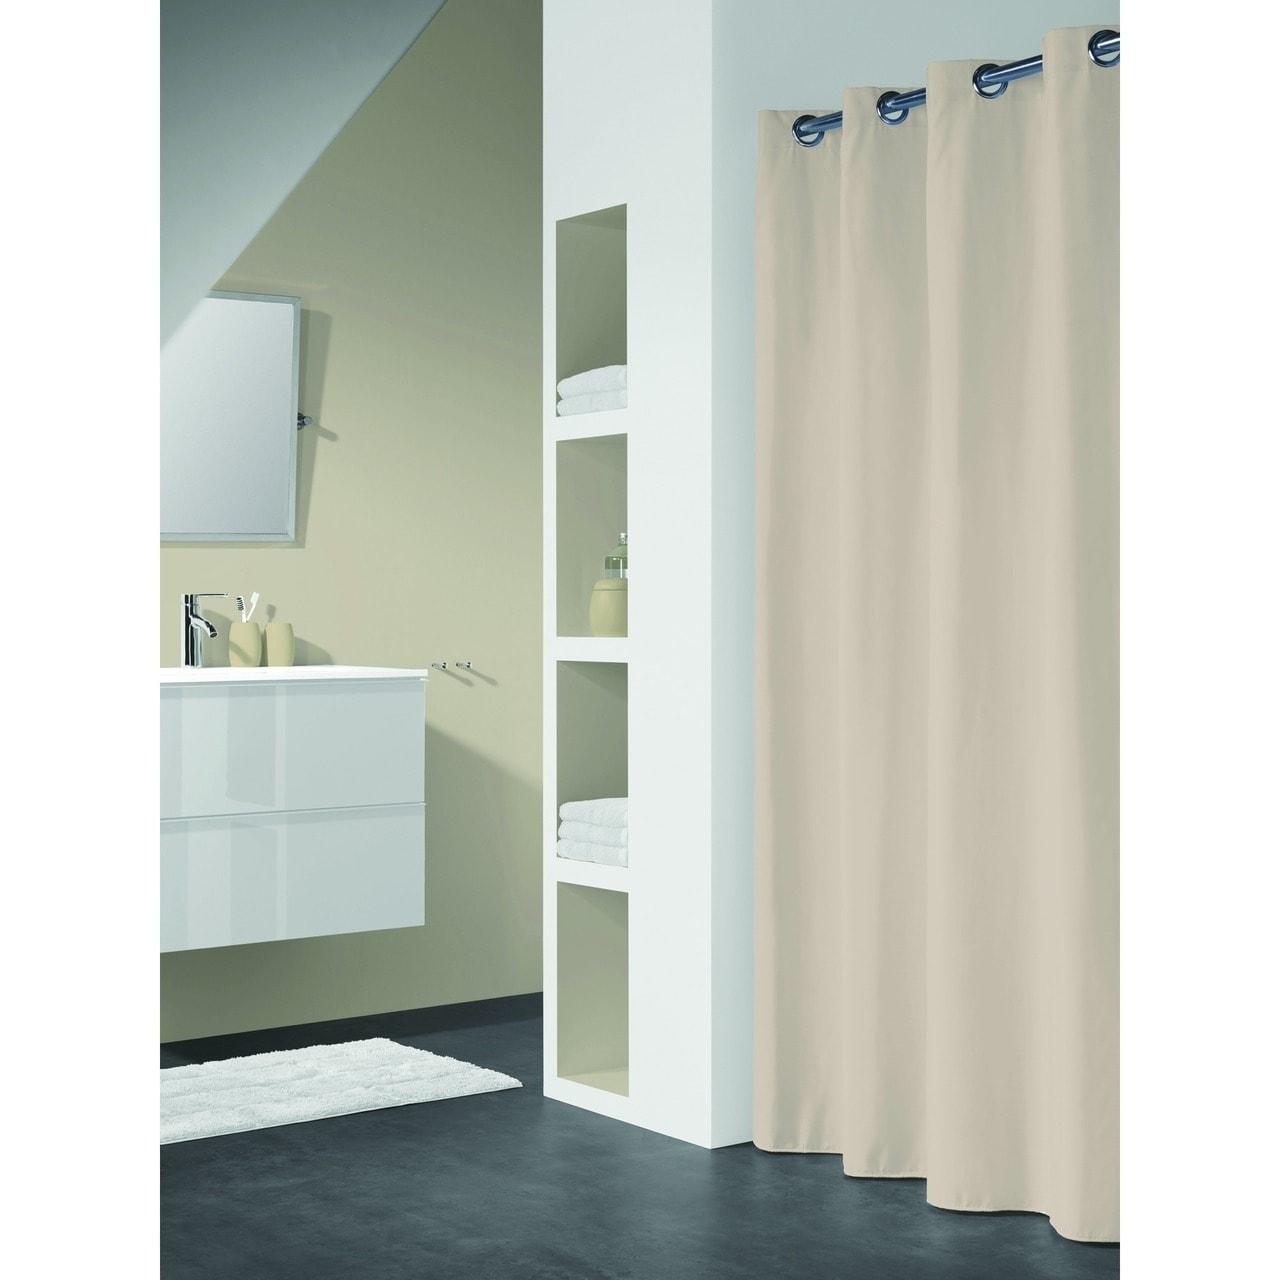 Shop Sealskin Extra Long Hookless Shower Curtain 78 X 72 Inch Coloris Beige Cotton